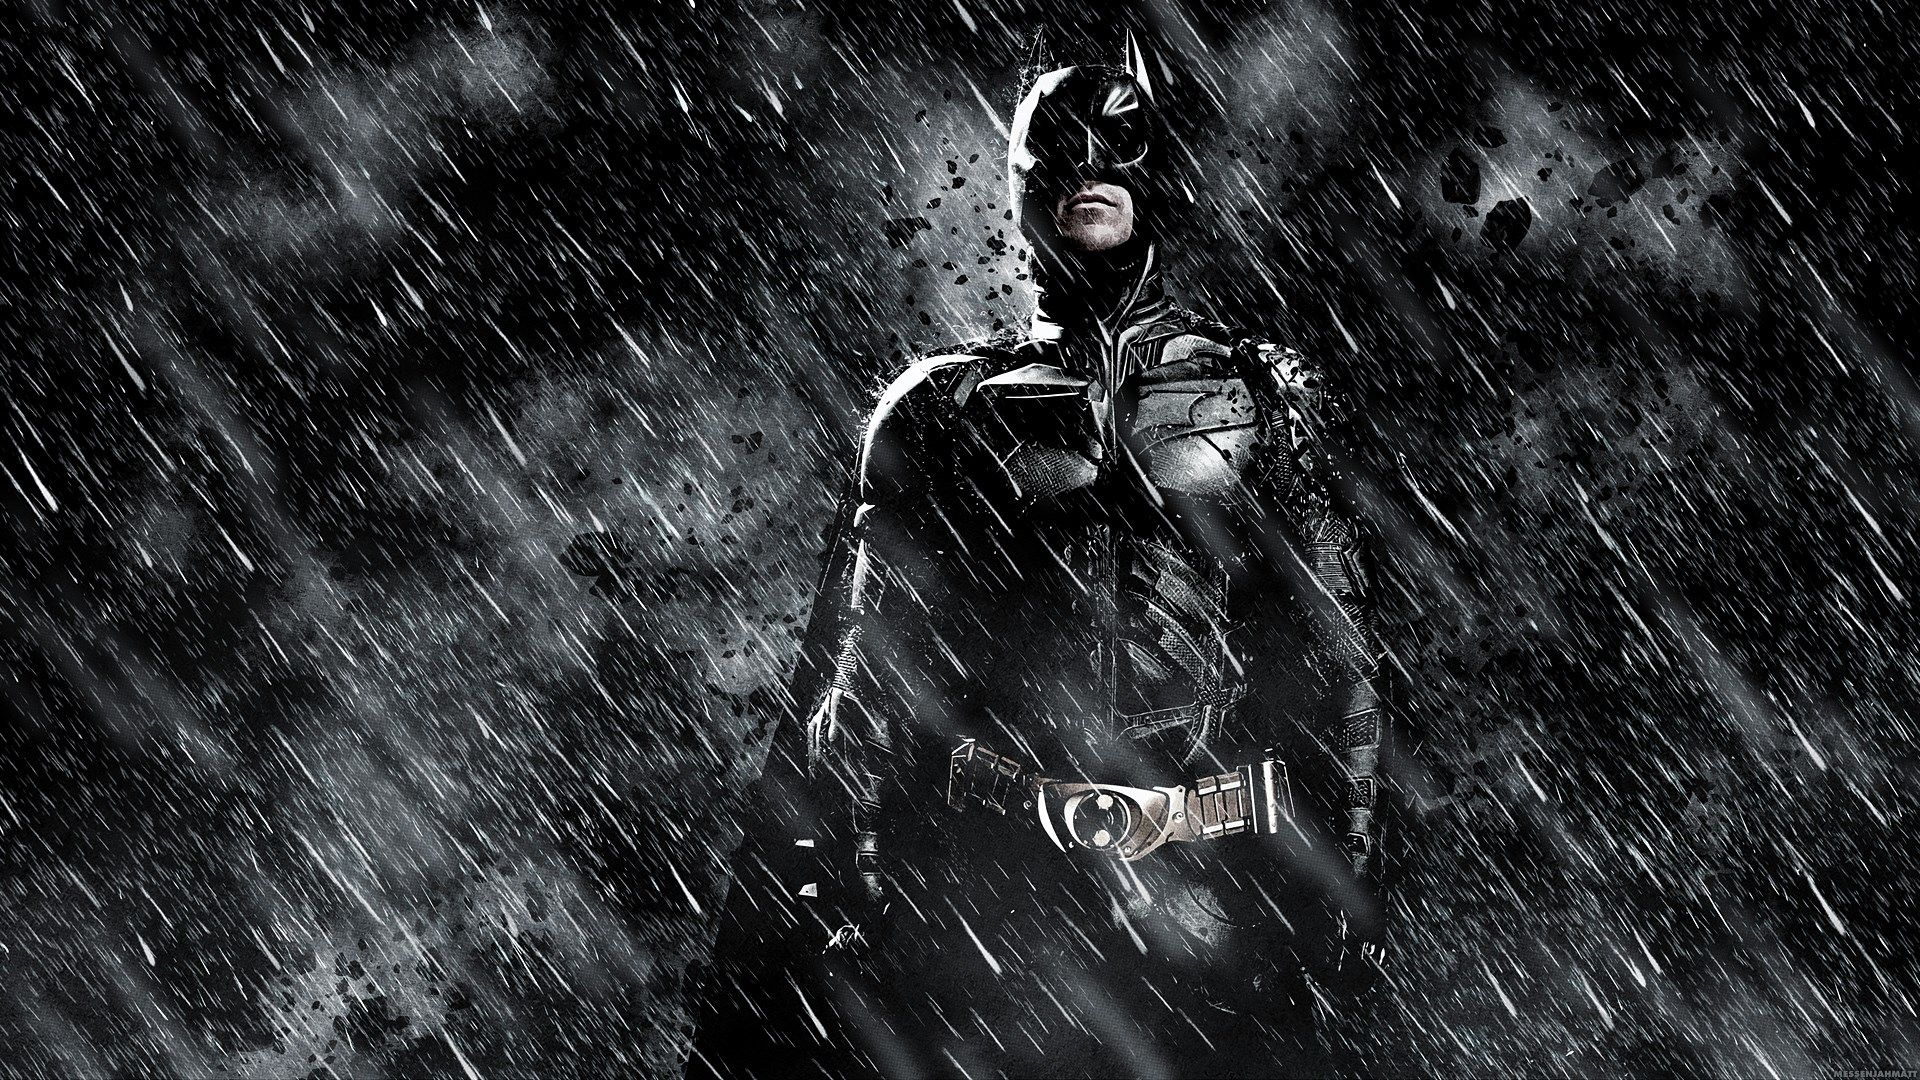 Batman Dark Knight Wallpaper The Dark Knight Rises Batman Arkham Knight Wallpaper Batman dark knight wallpaper hd 1080p